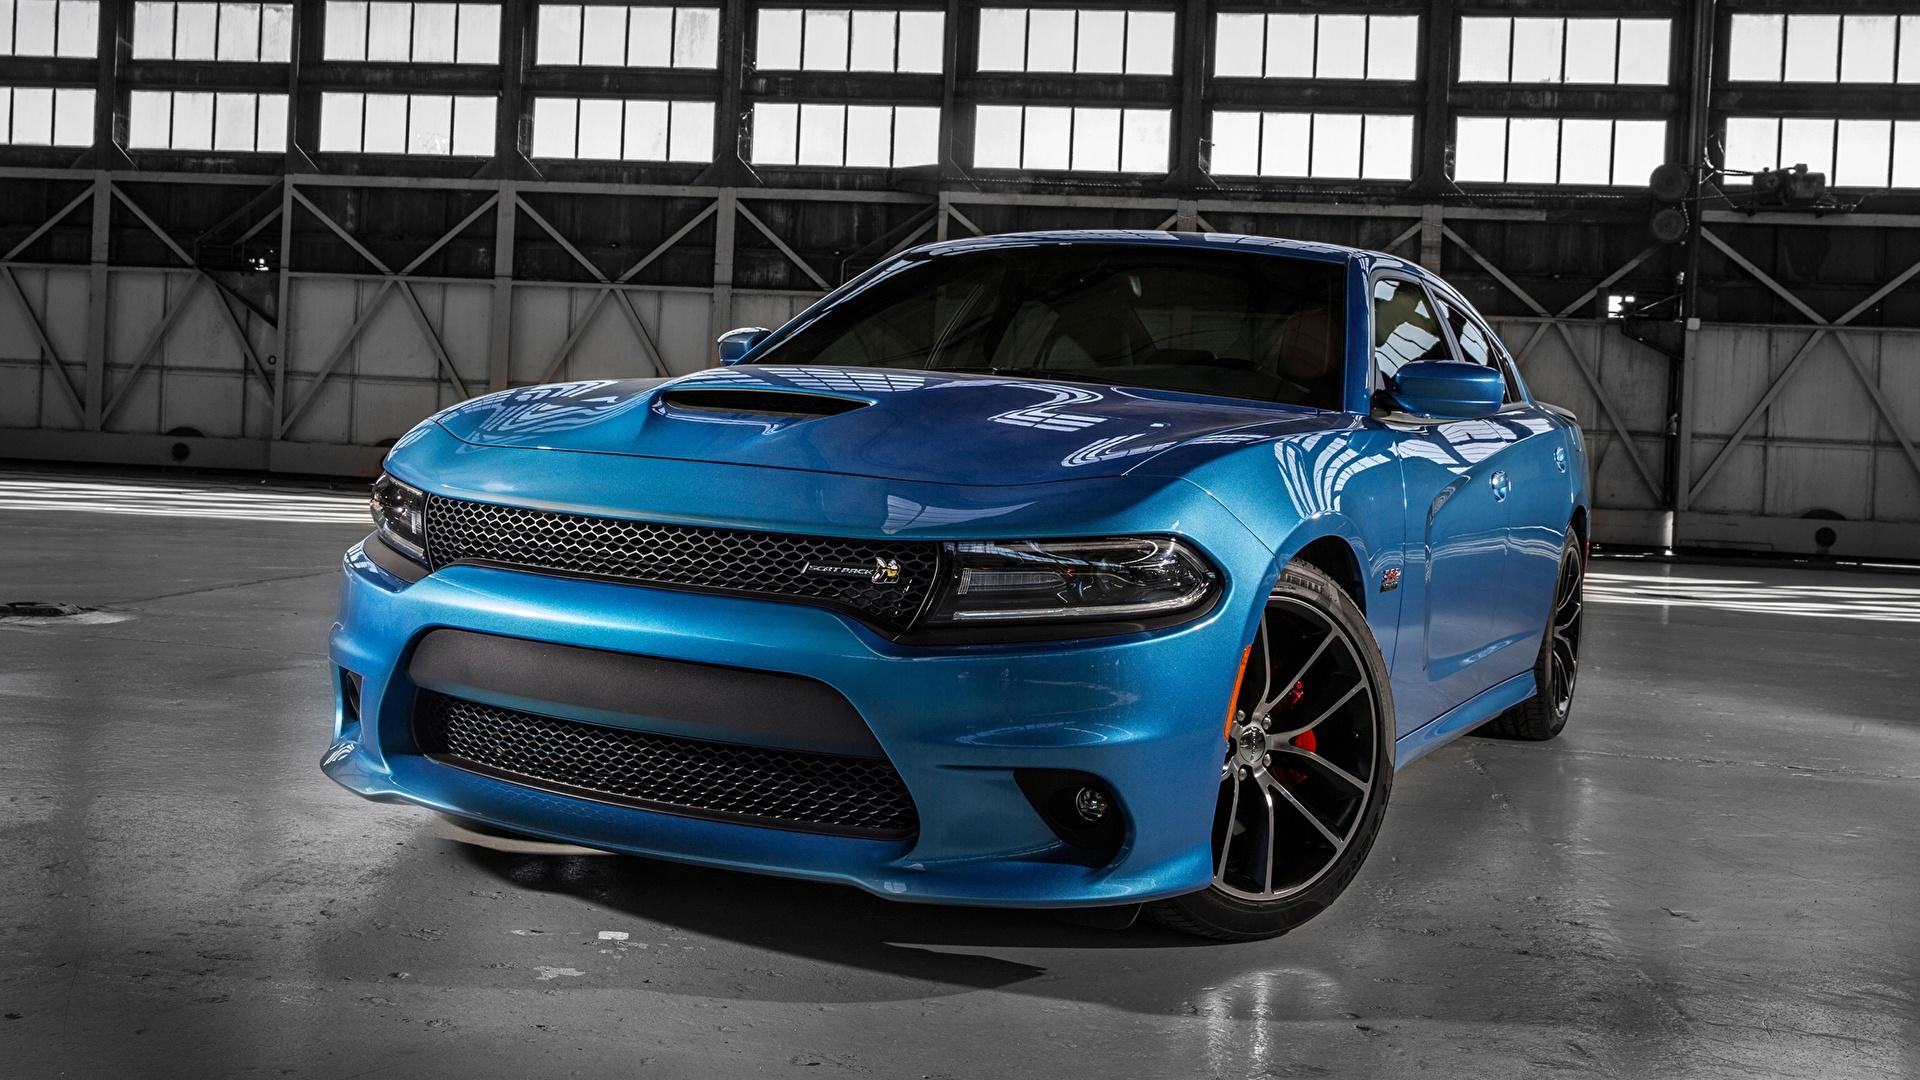 Фотография Dodge Charger R/T, Scat Pack, 2015 Седан Голубой Спереди Металлик Автомобили 1920x1080 Додж голубая голубые голубых авто машины машина автомобиль